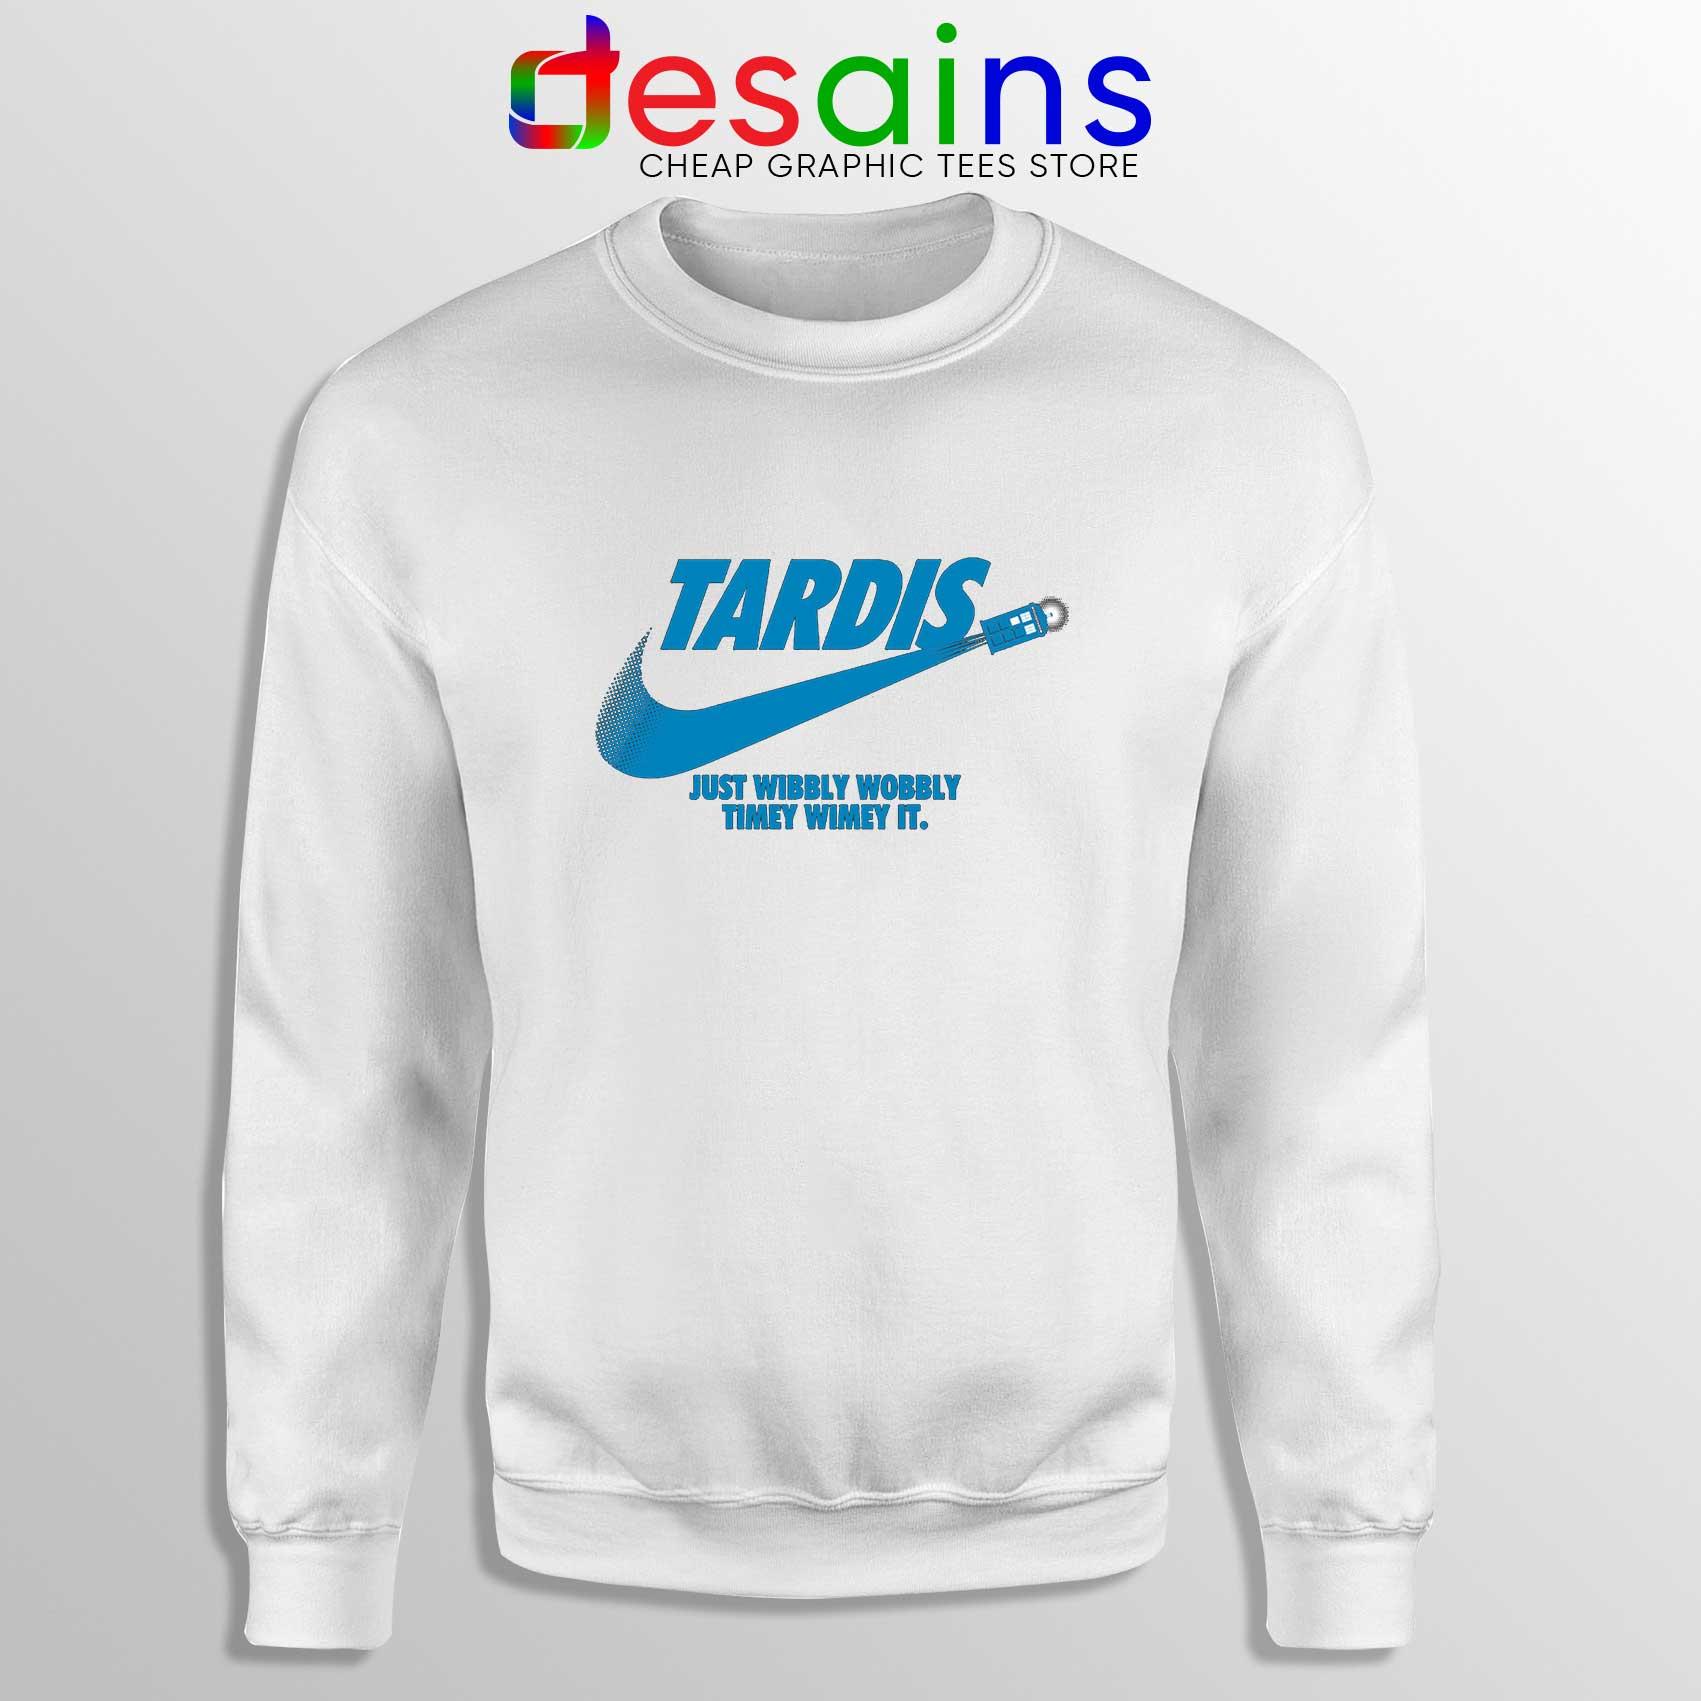 Nike Tardis Just Wibbly Wobbly Hoodies Sweatshirts